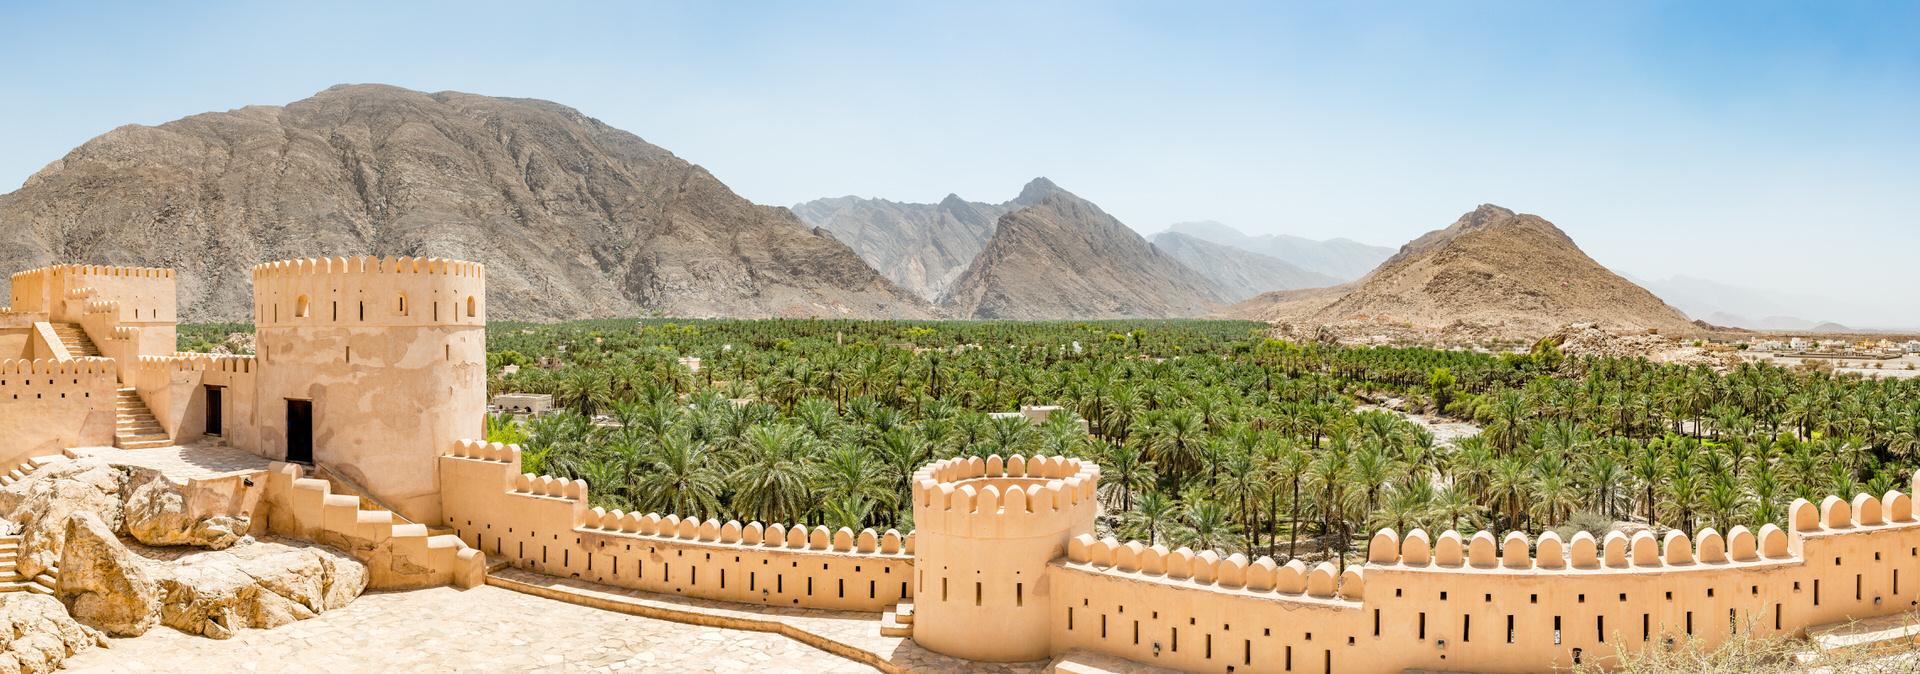 > Oman Touring Options